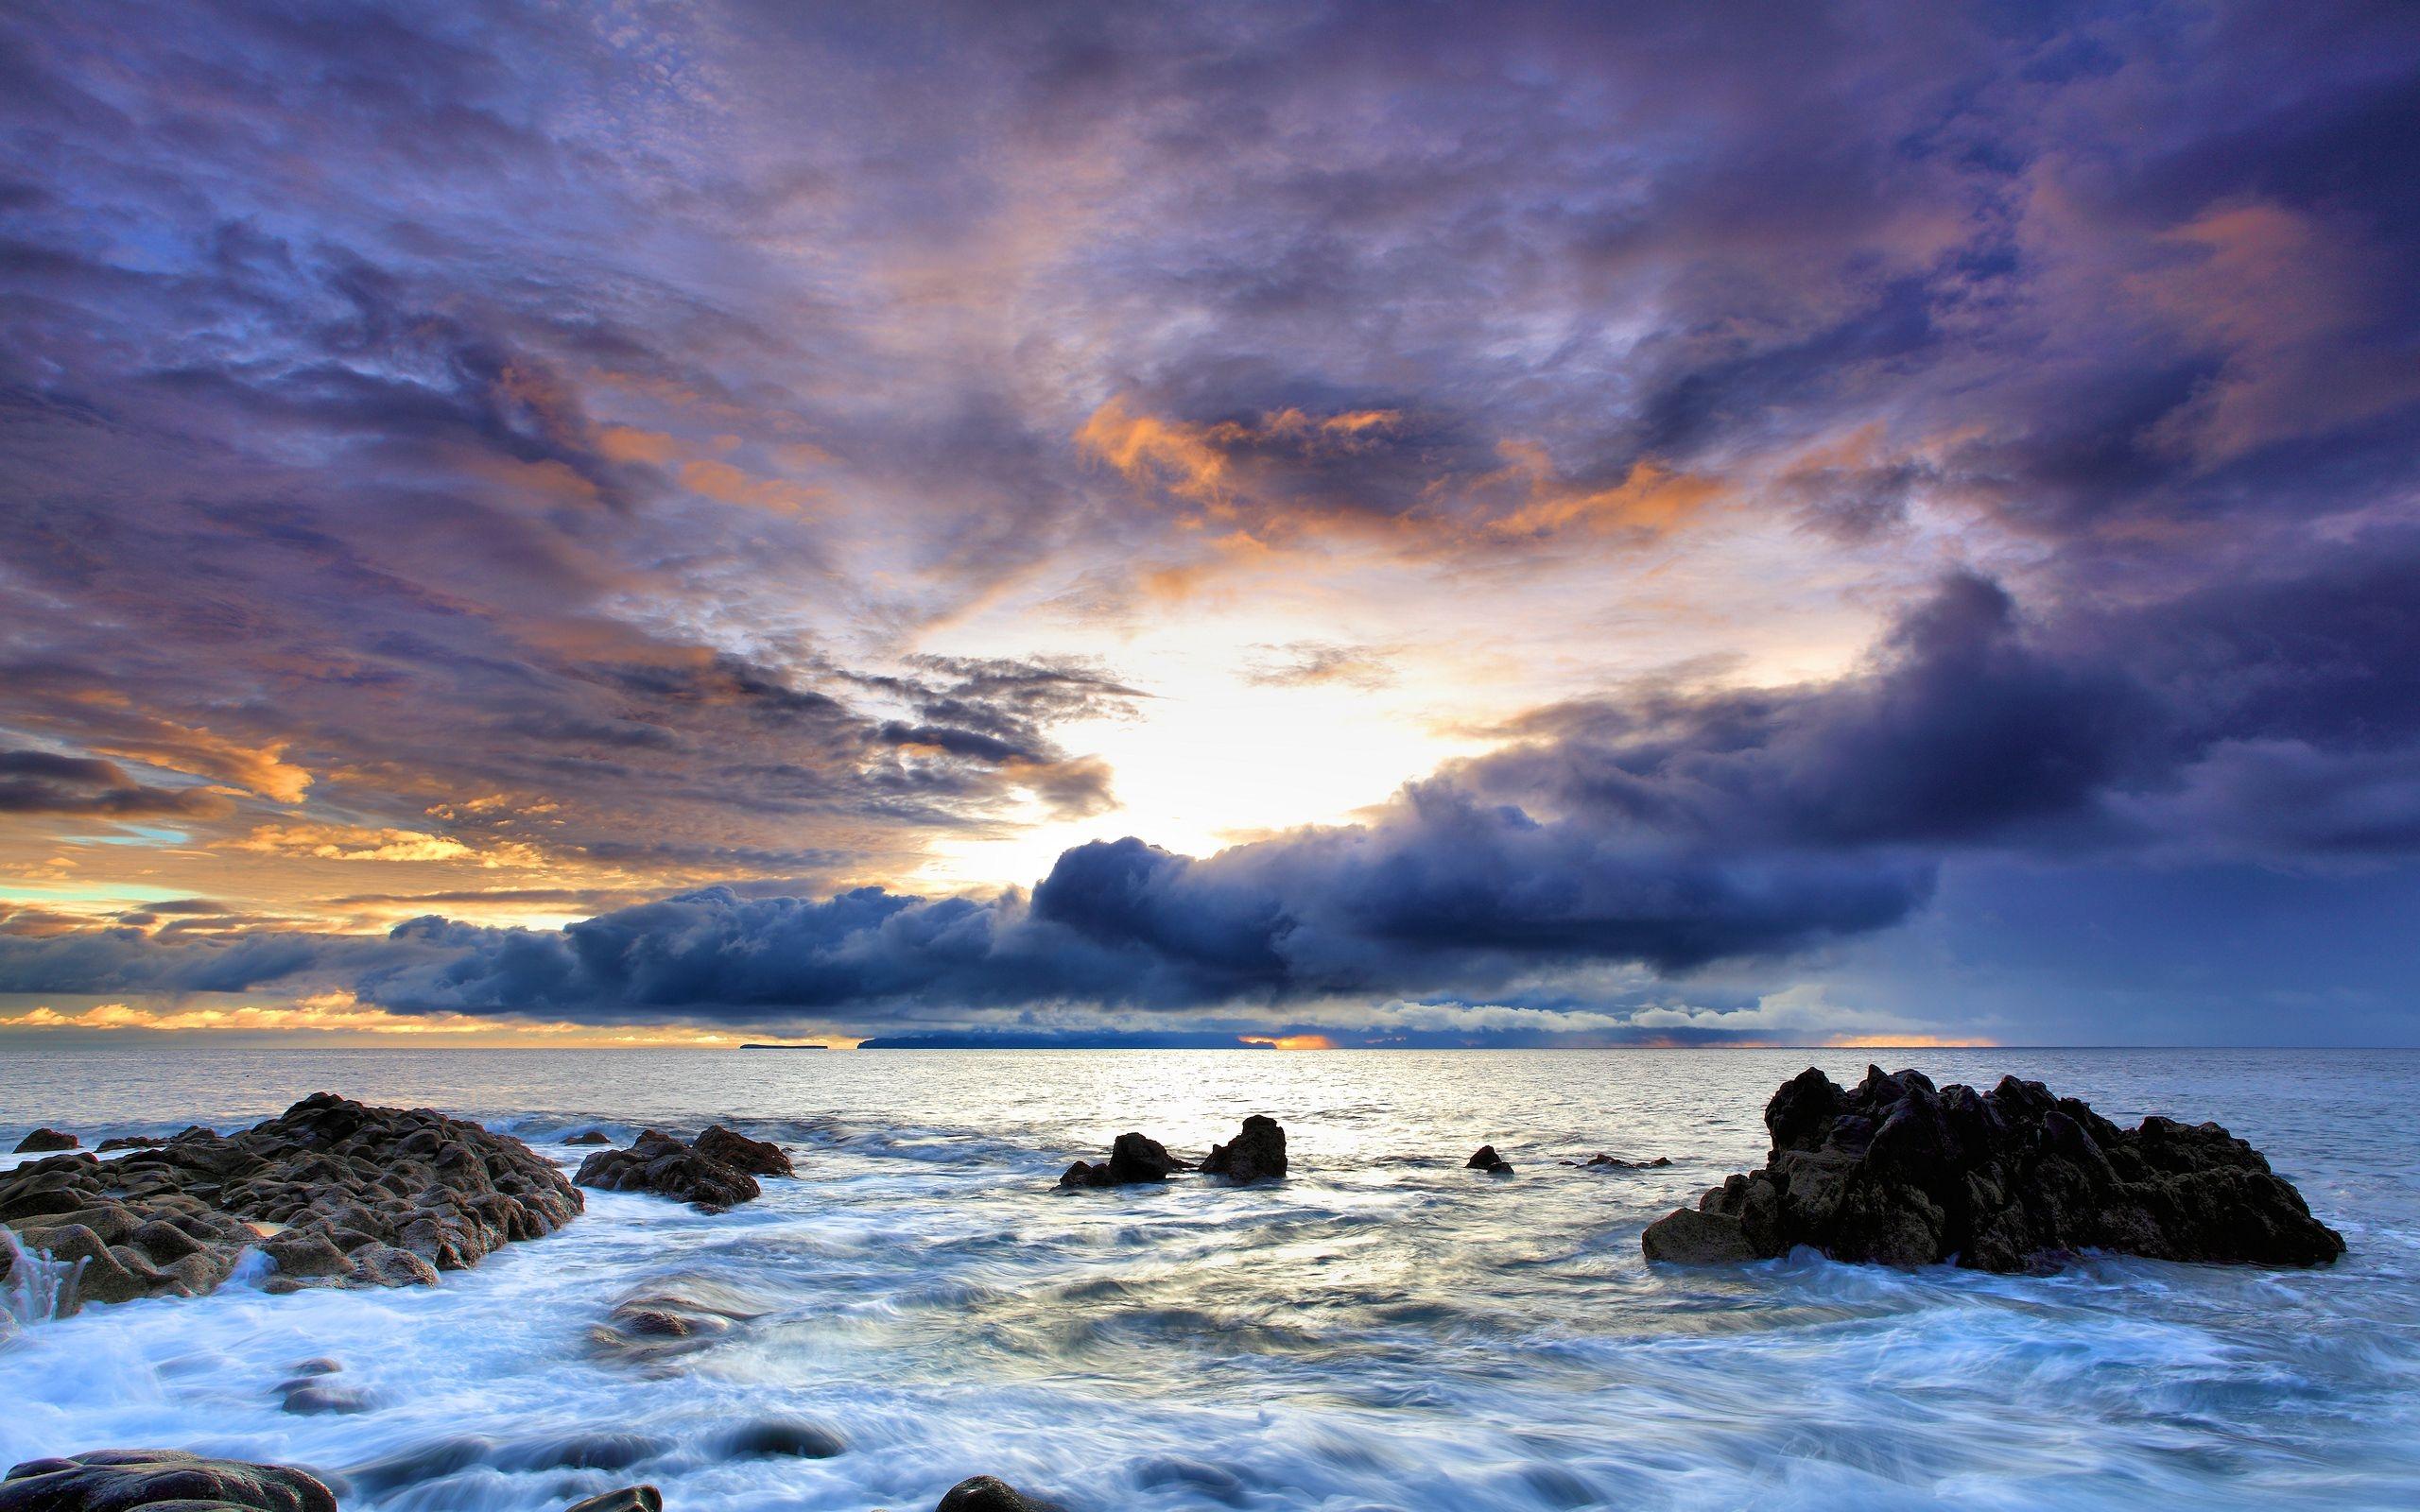 горизонт камни море вода океан природа  № 2556147  скачать